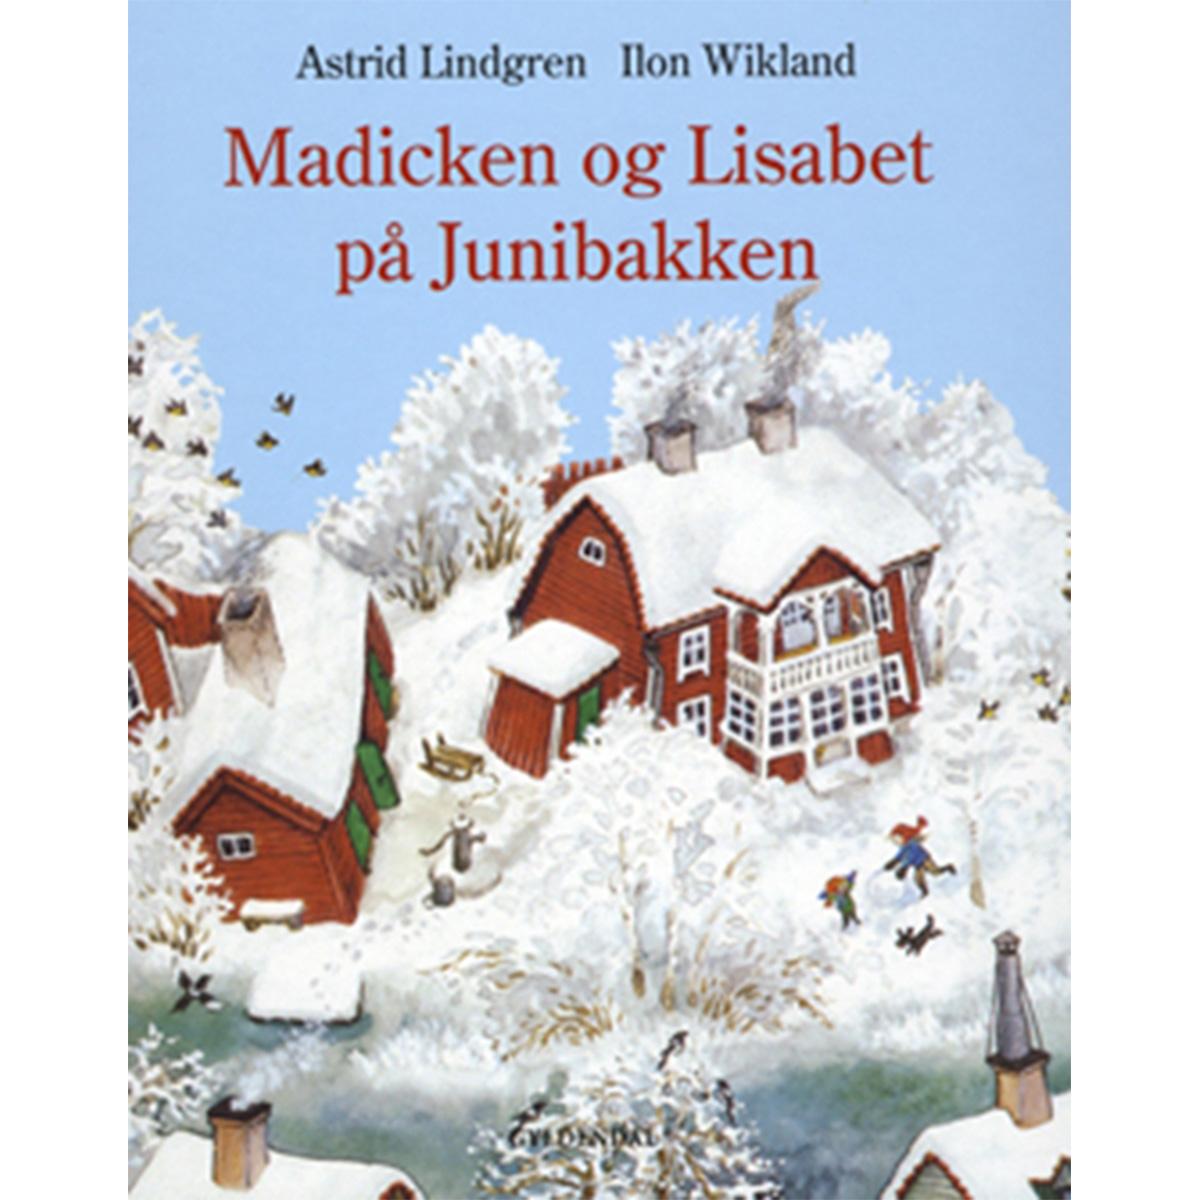 Madicken og Lisabet på Junibakken - Indbundet